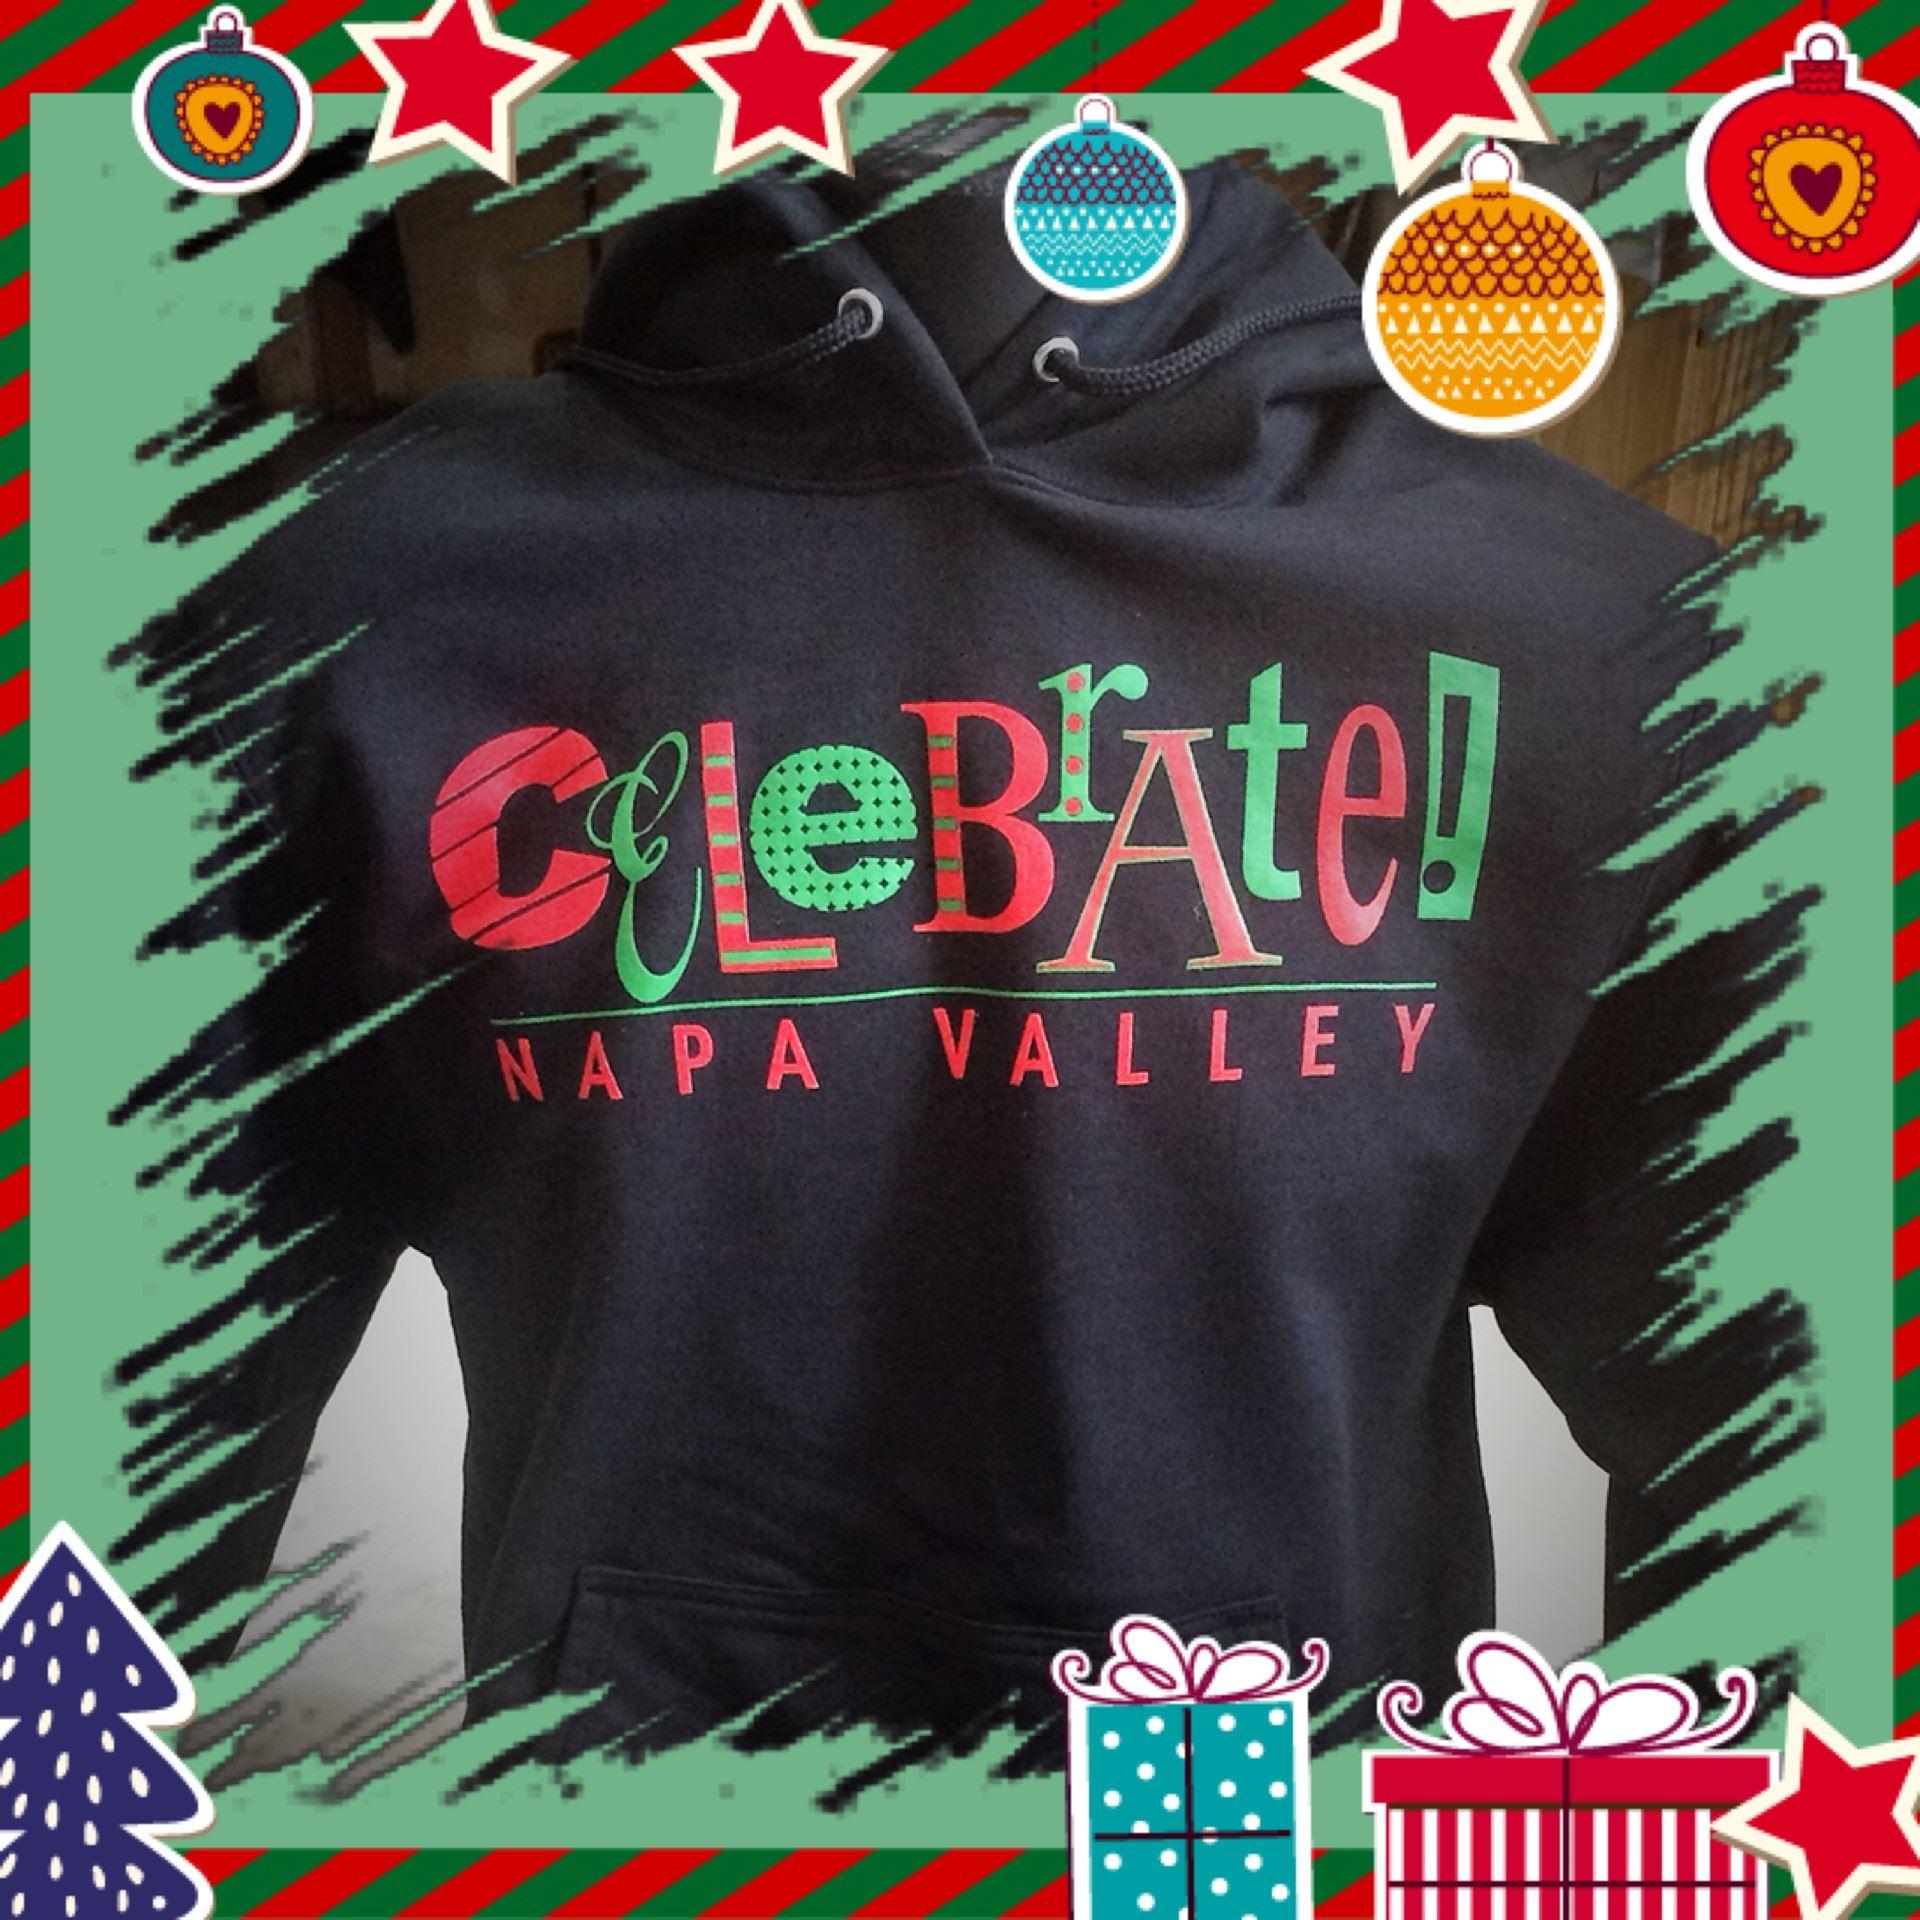 Celebrate! Napa Valley Holiday Sweatshirts